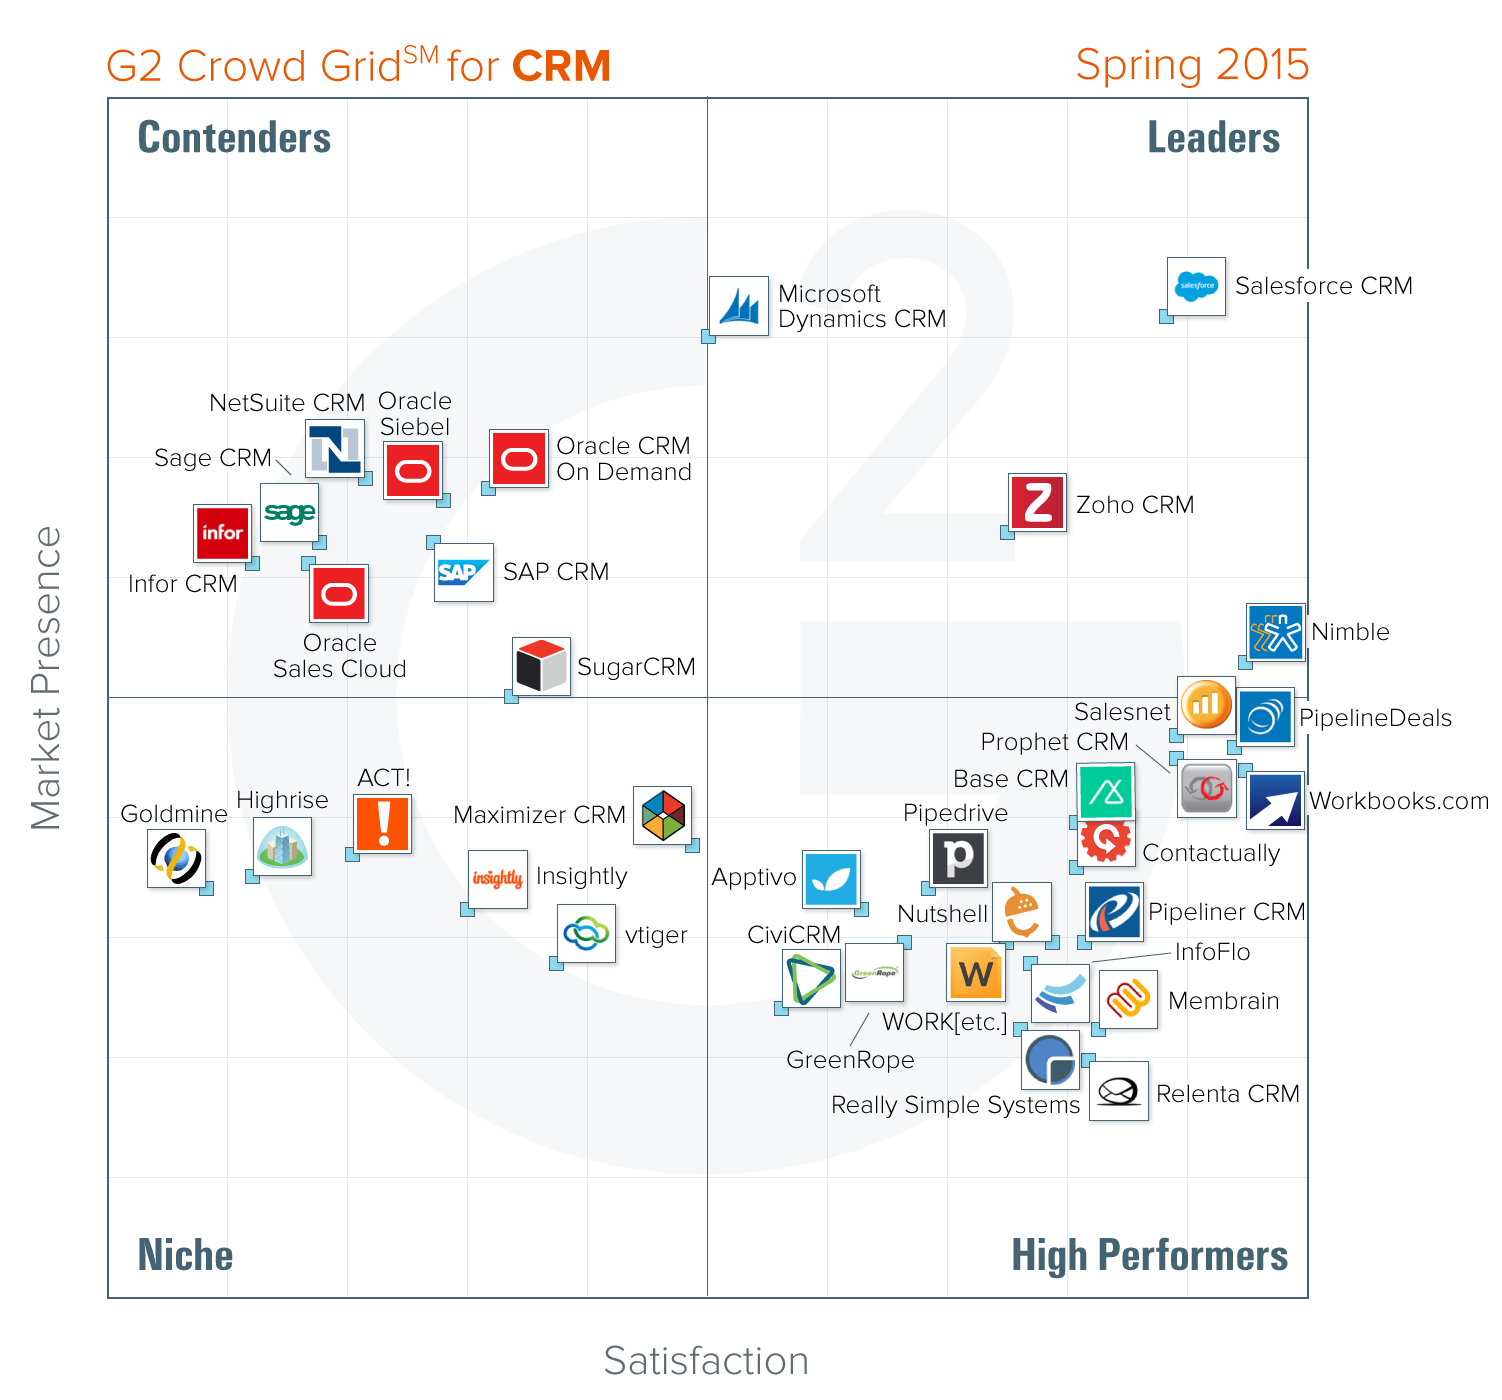 Best crm software spring 2015 g2 crowd